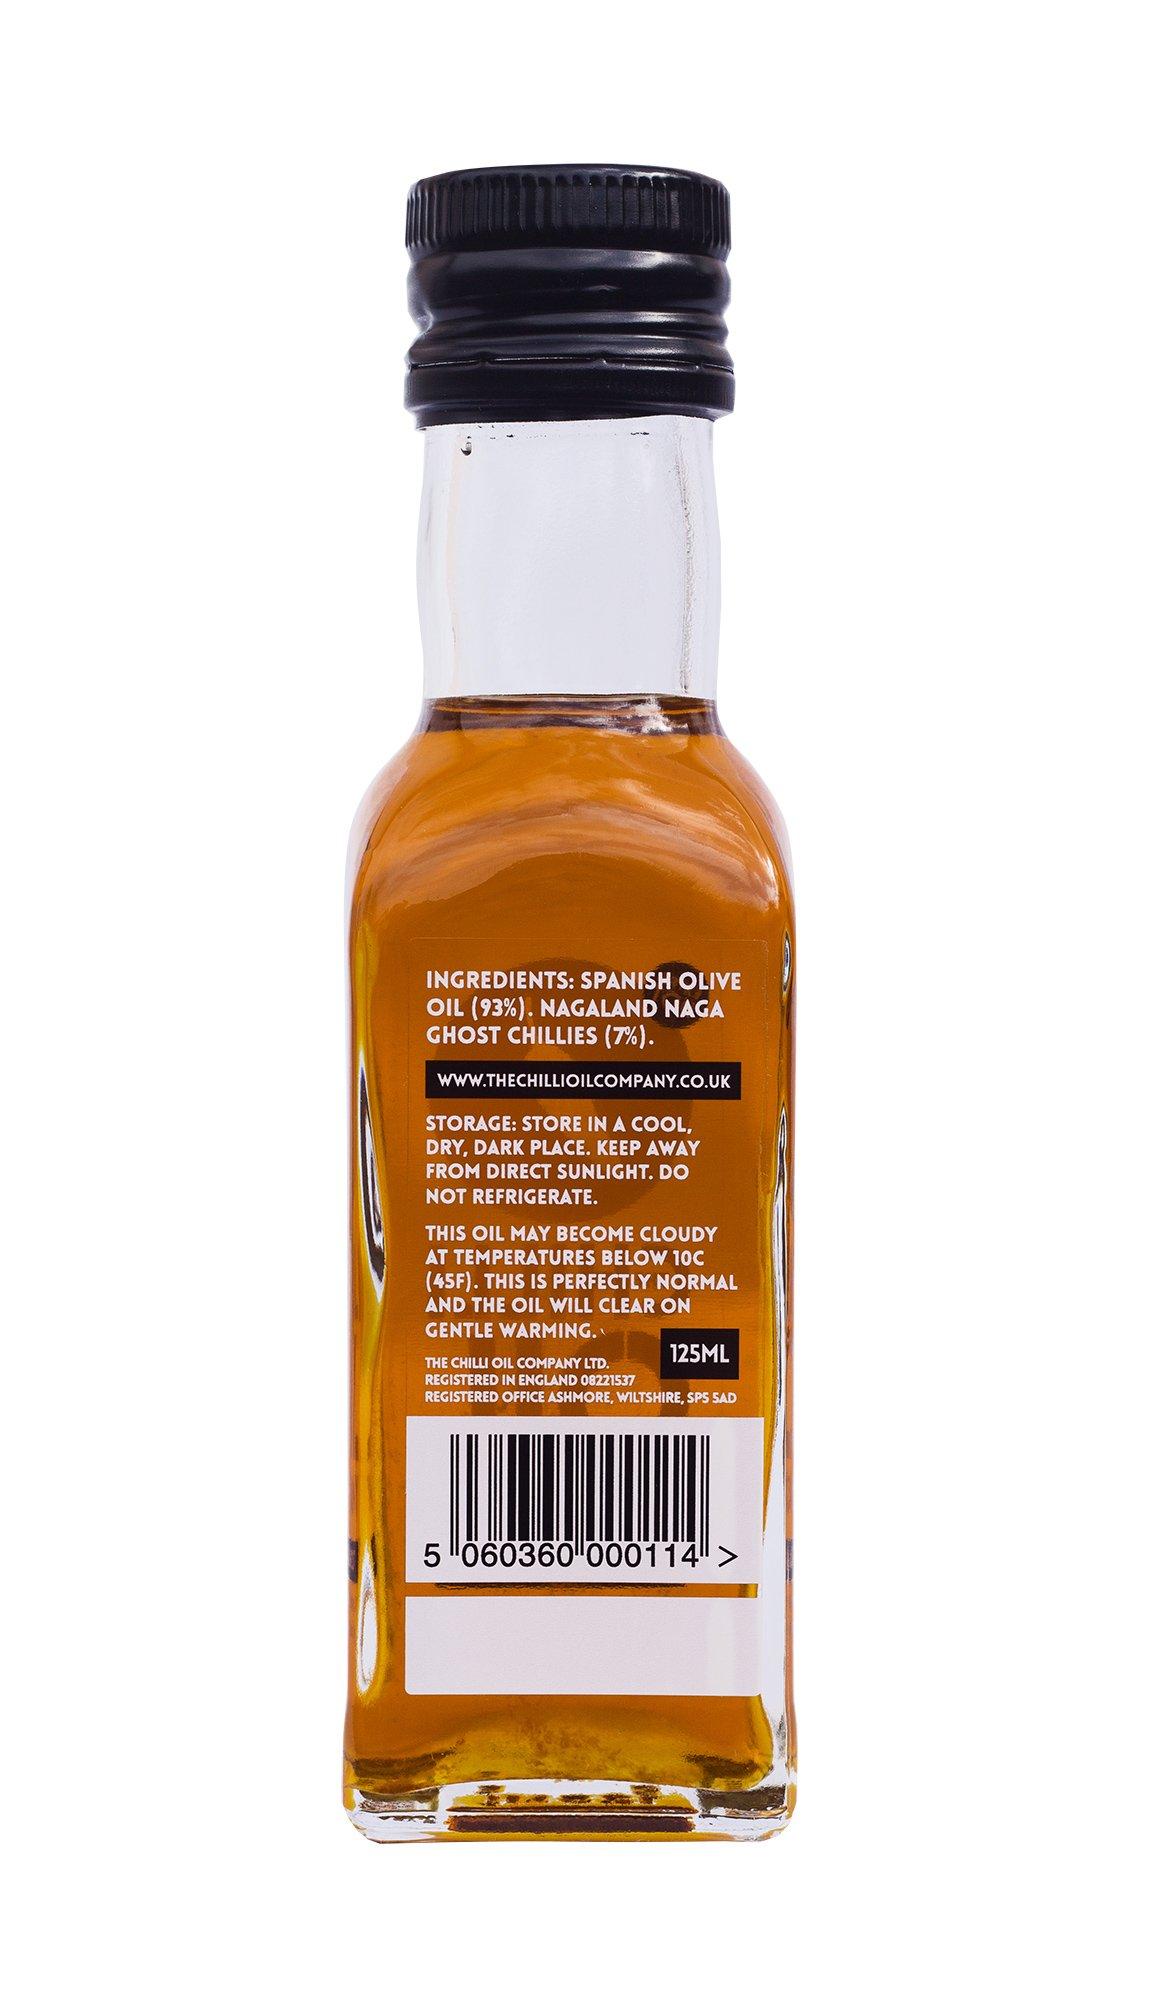 Naga Ghost Chilli Oil